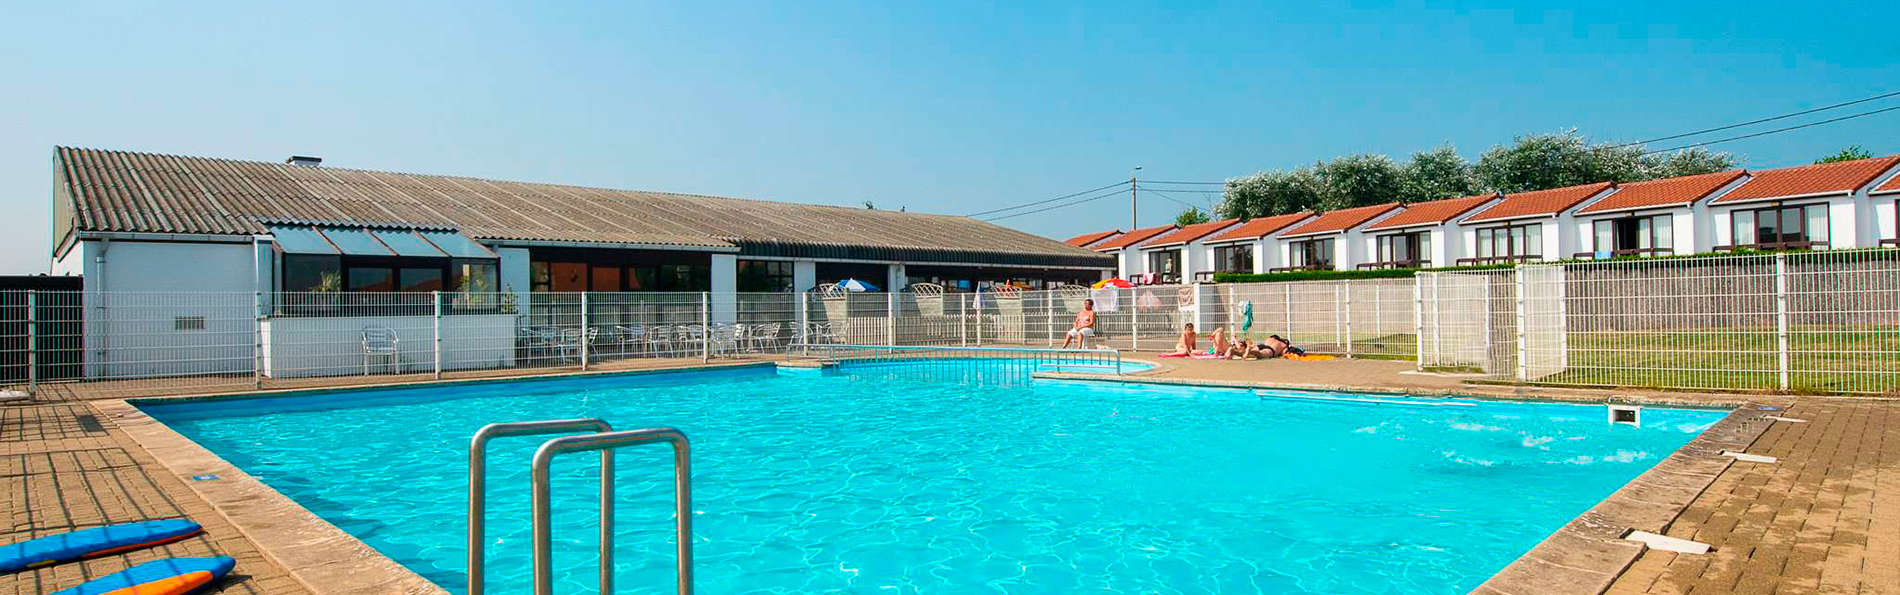 Week end la mer middelkerke avec acc s la piscine ext rieure partir de 64 for Swimming pool technician salary